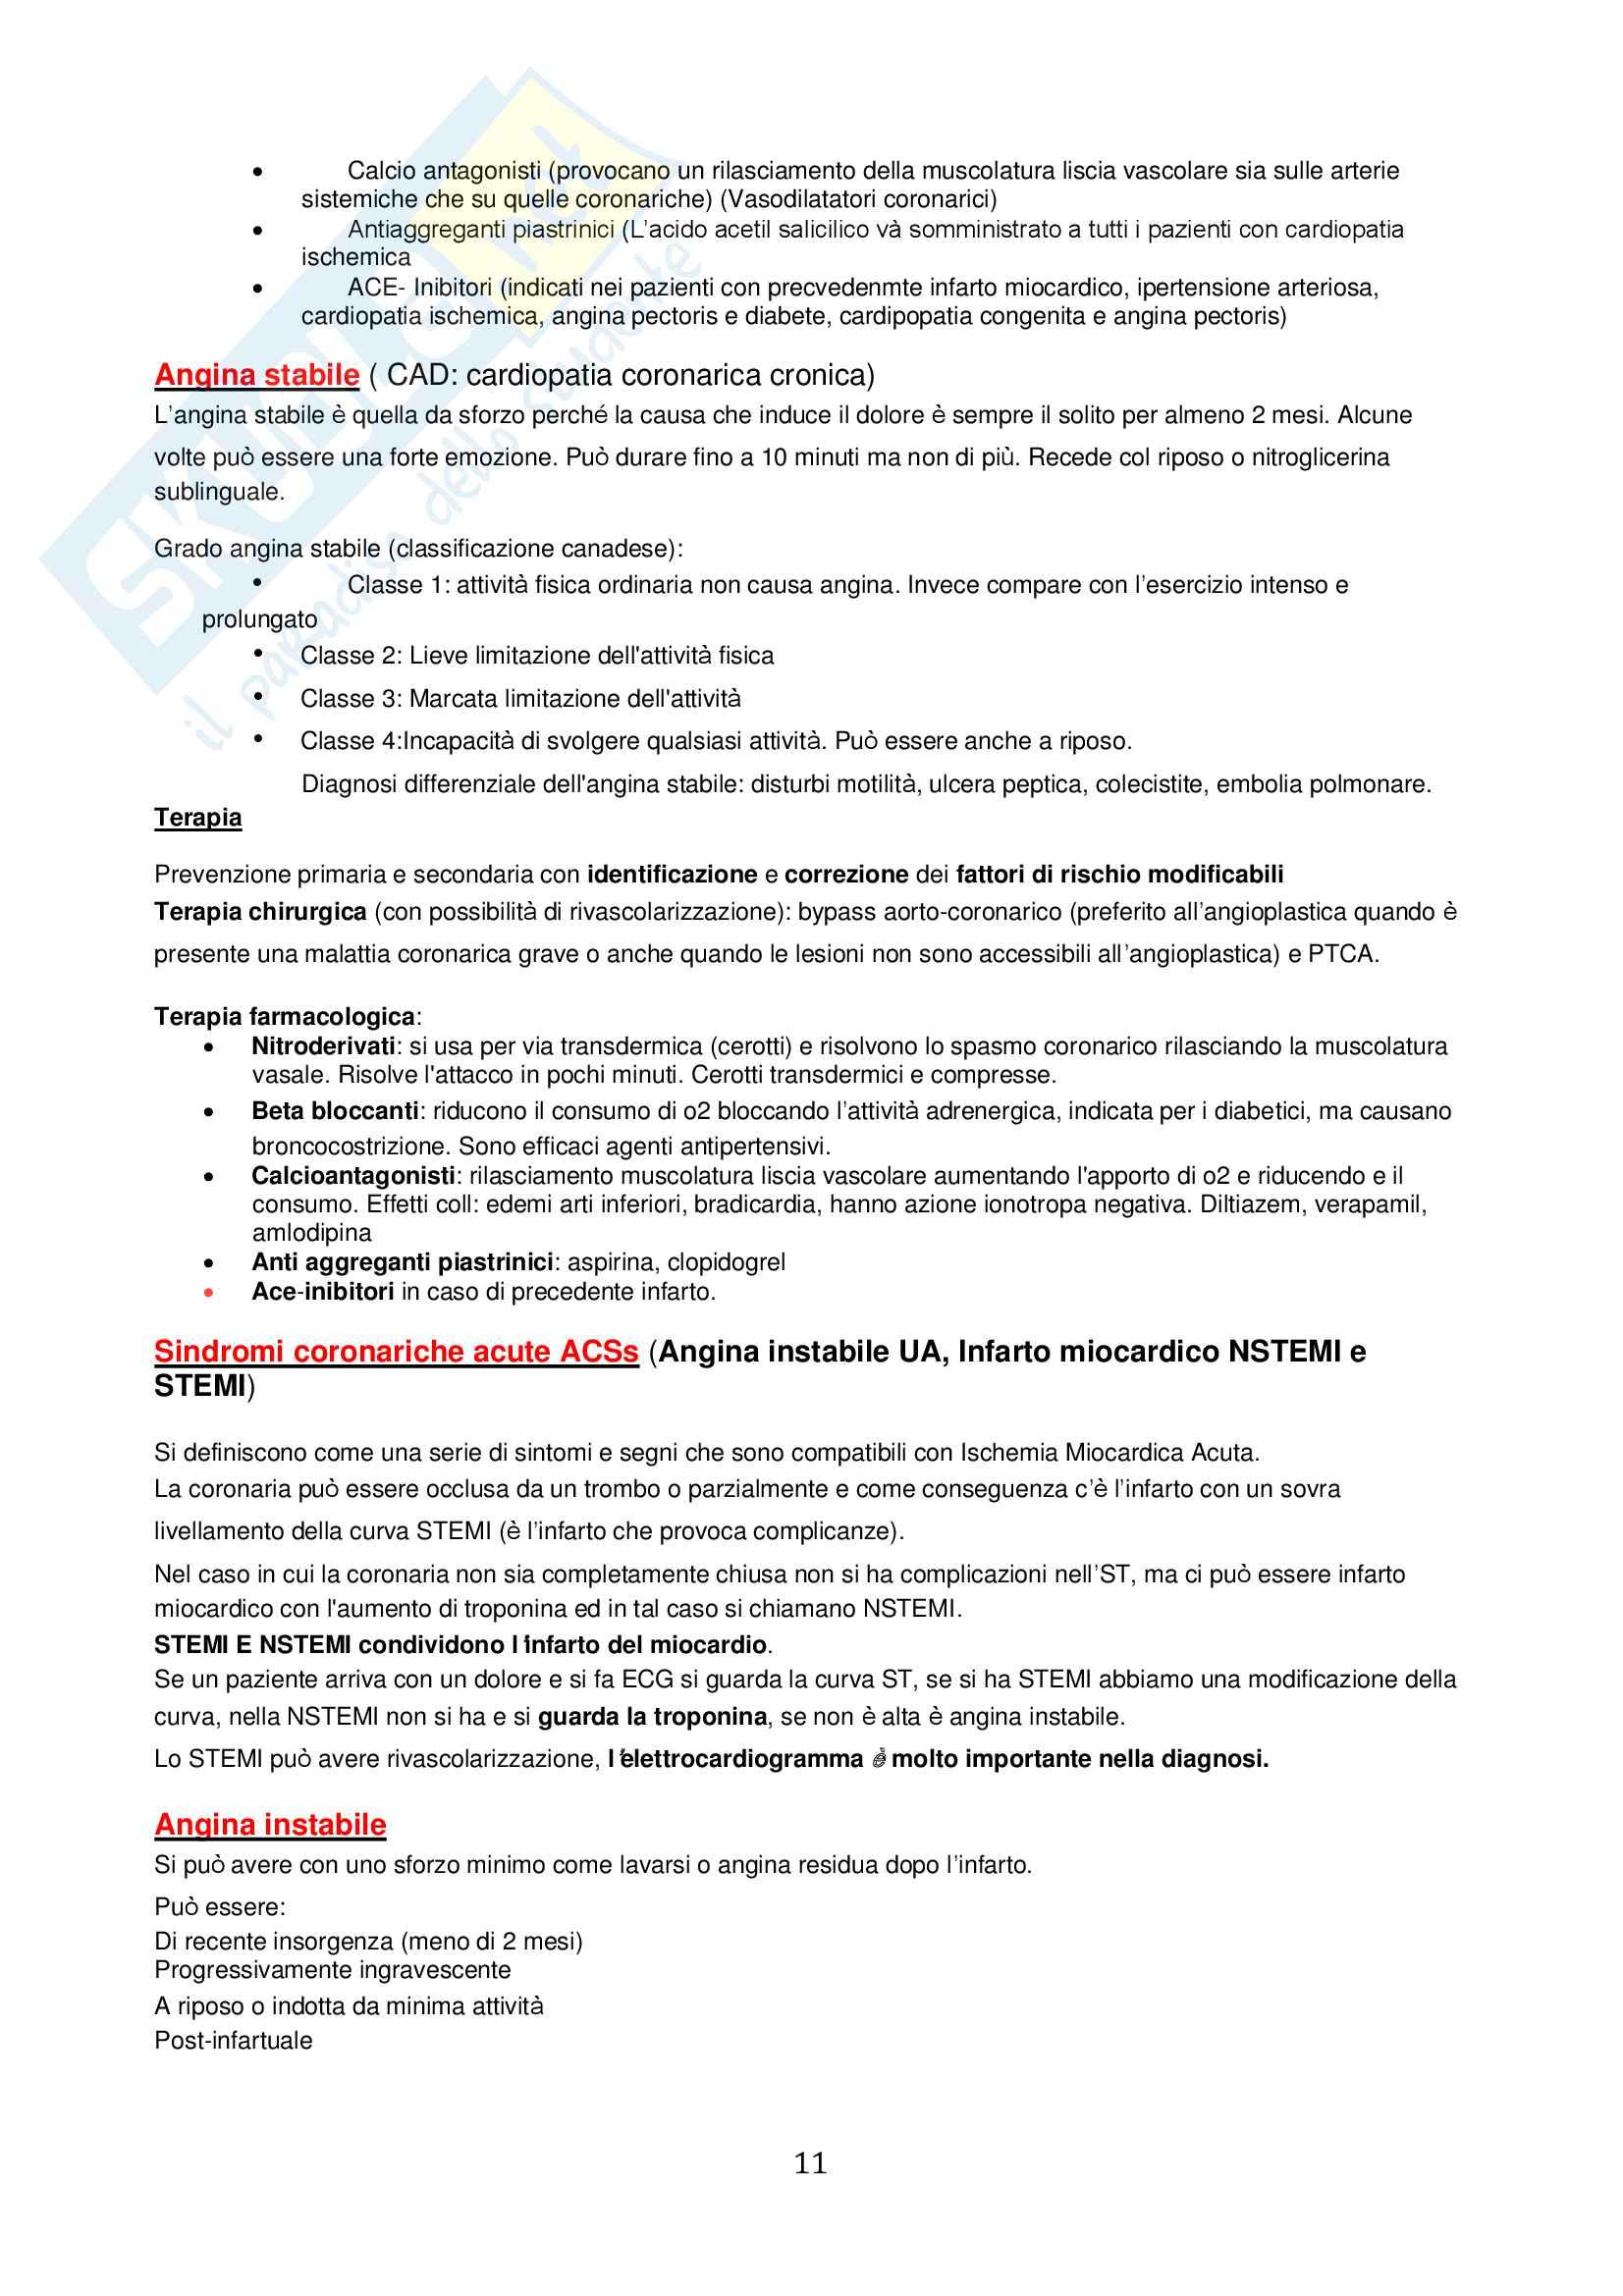 Medicina interna Completo Pag. 11